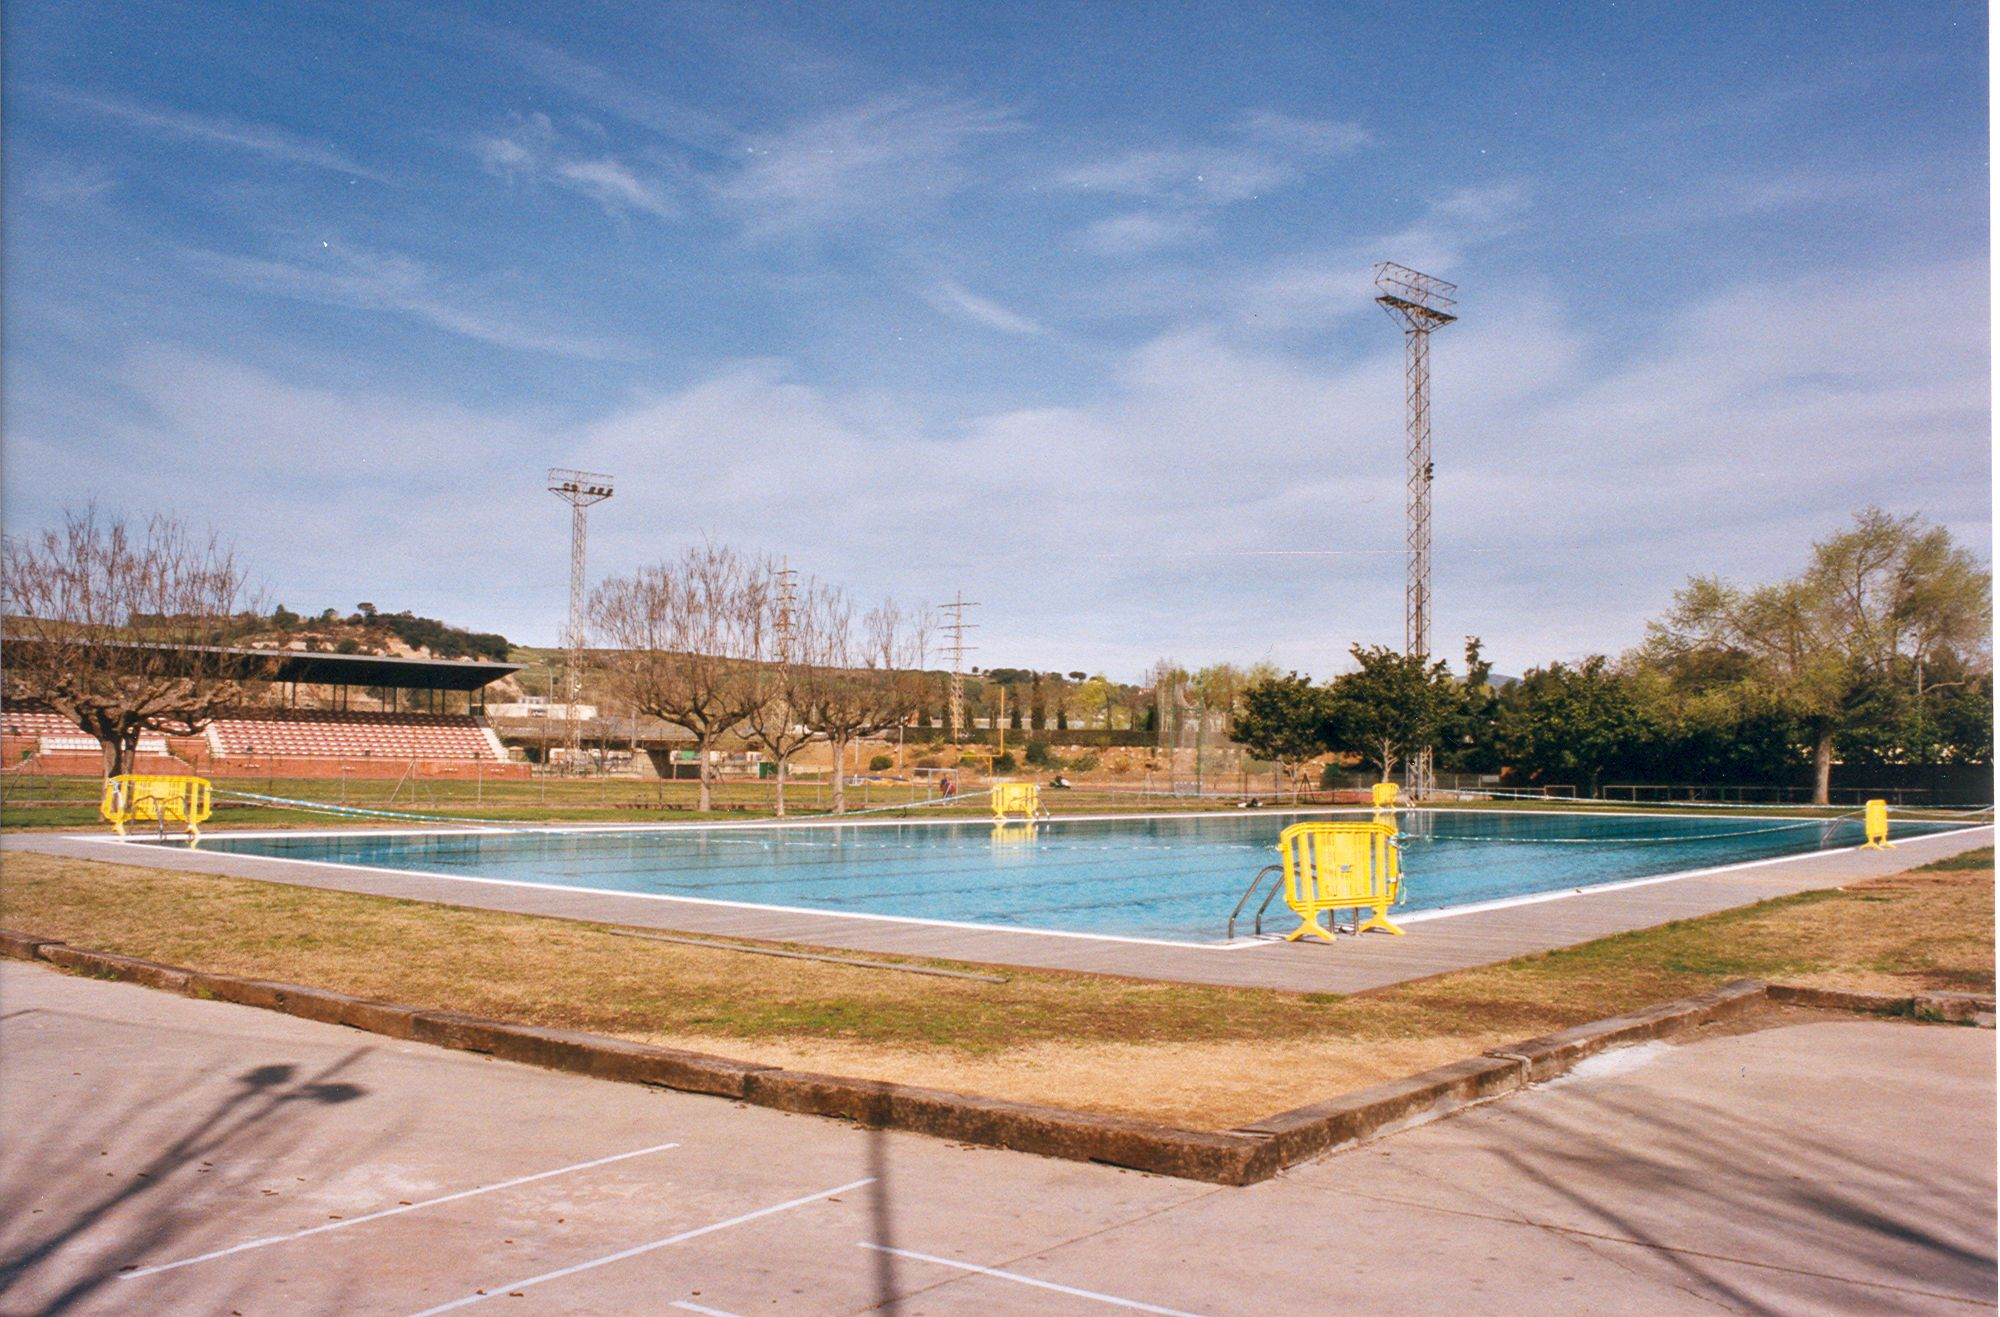 piscines municipals de granollers ajuntament de granollers